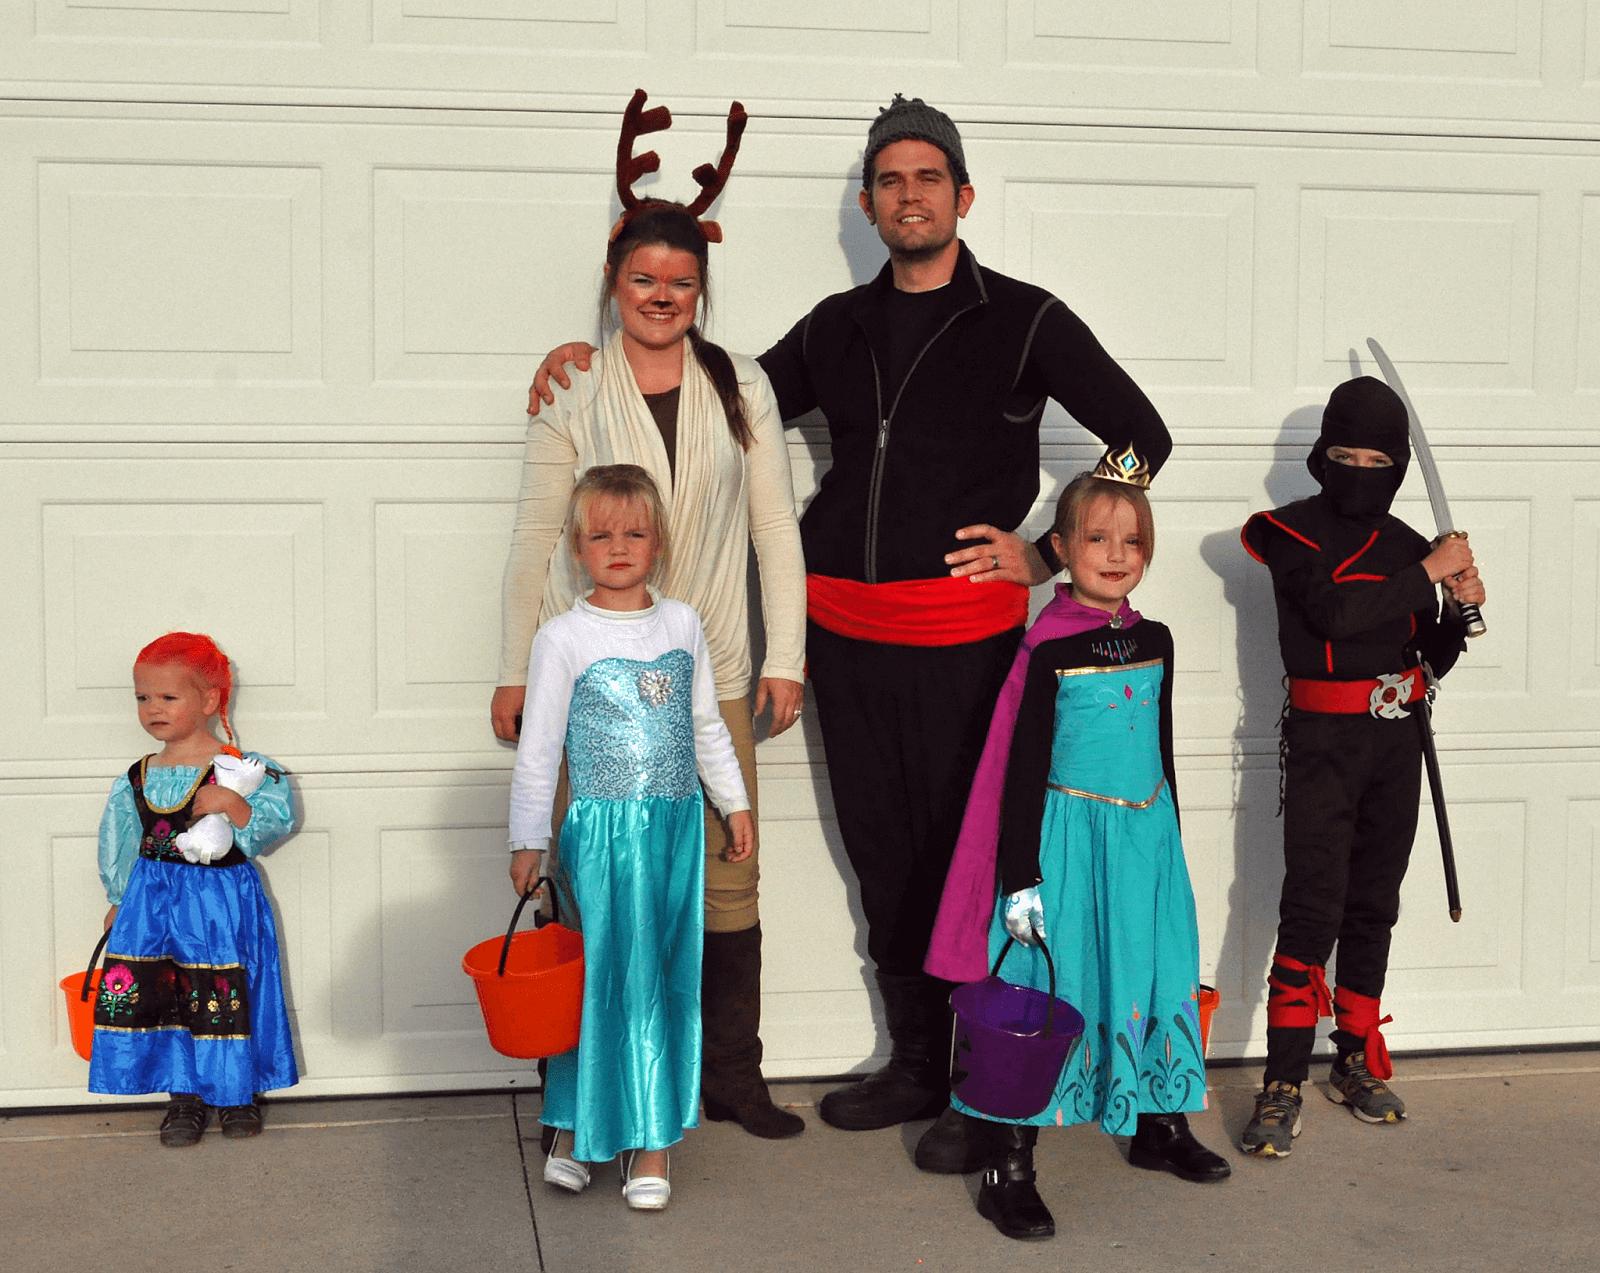 Frozen Theme family costume